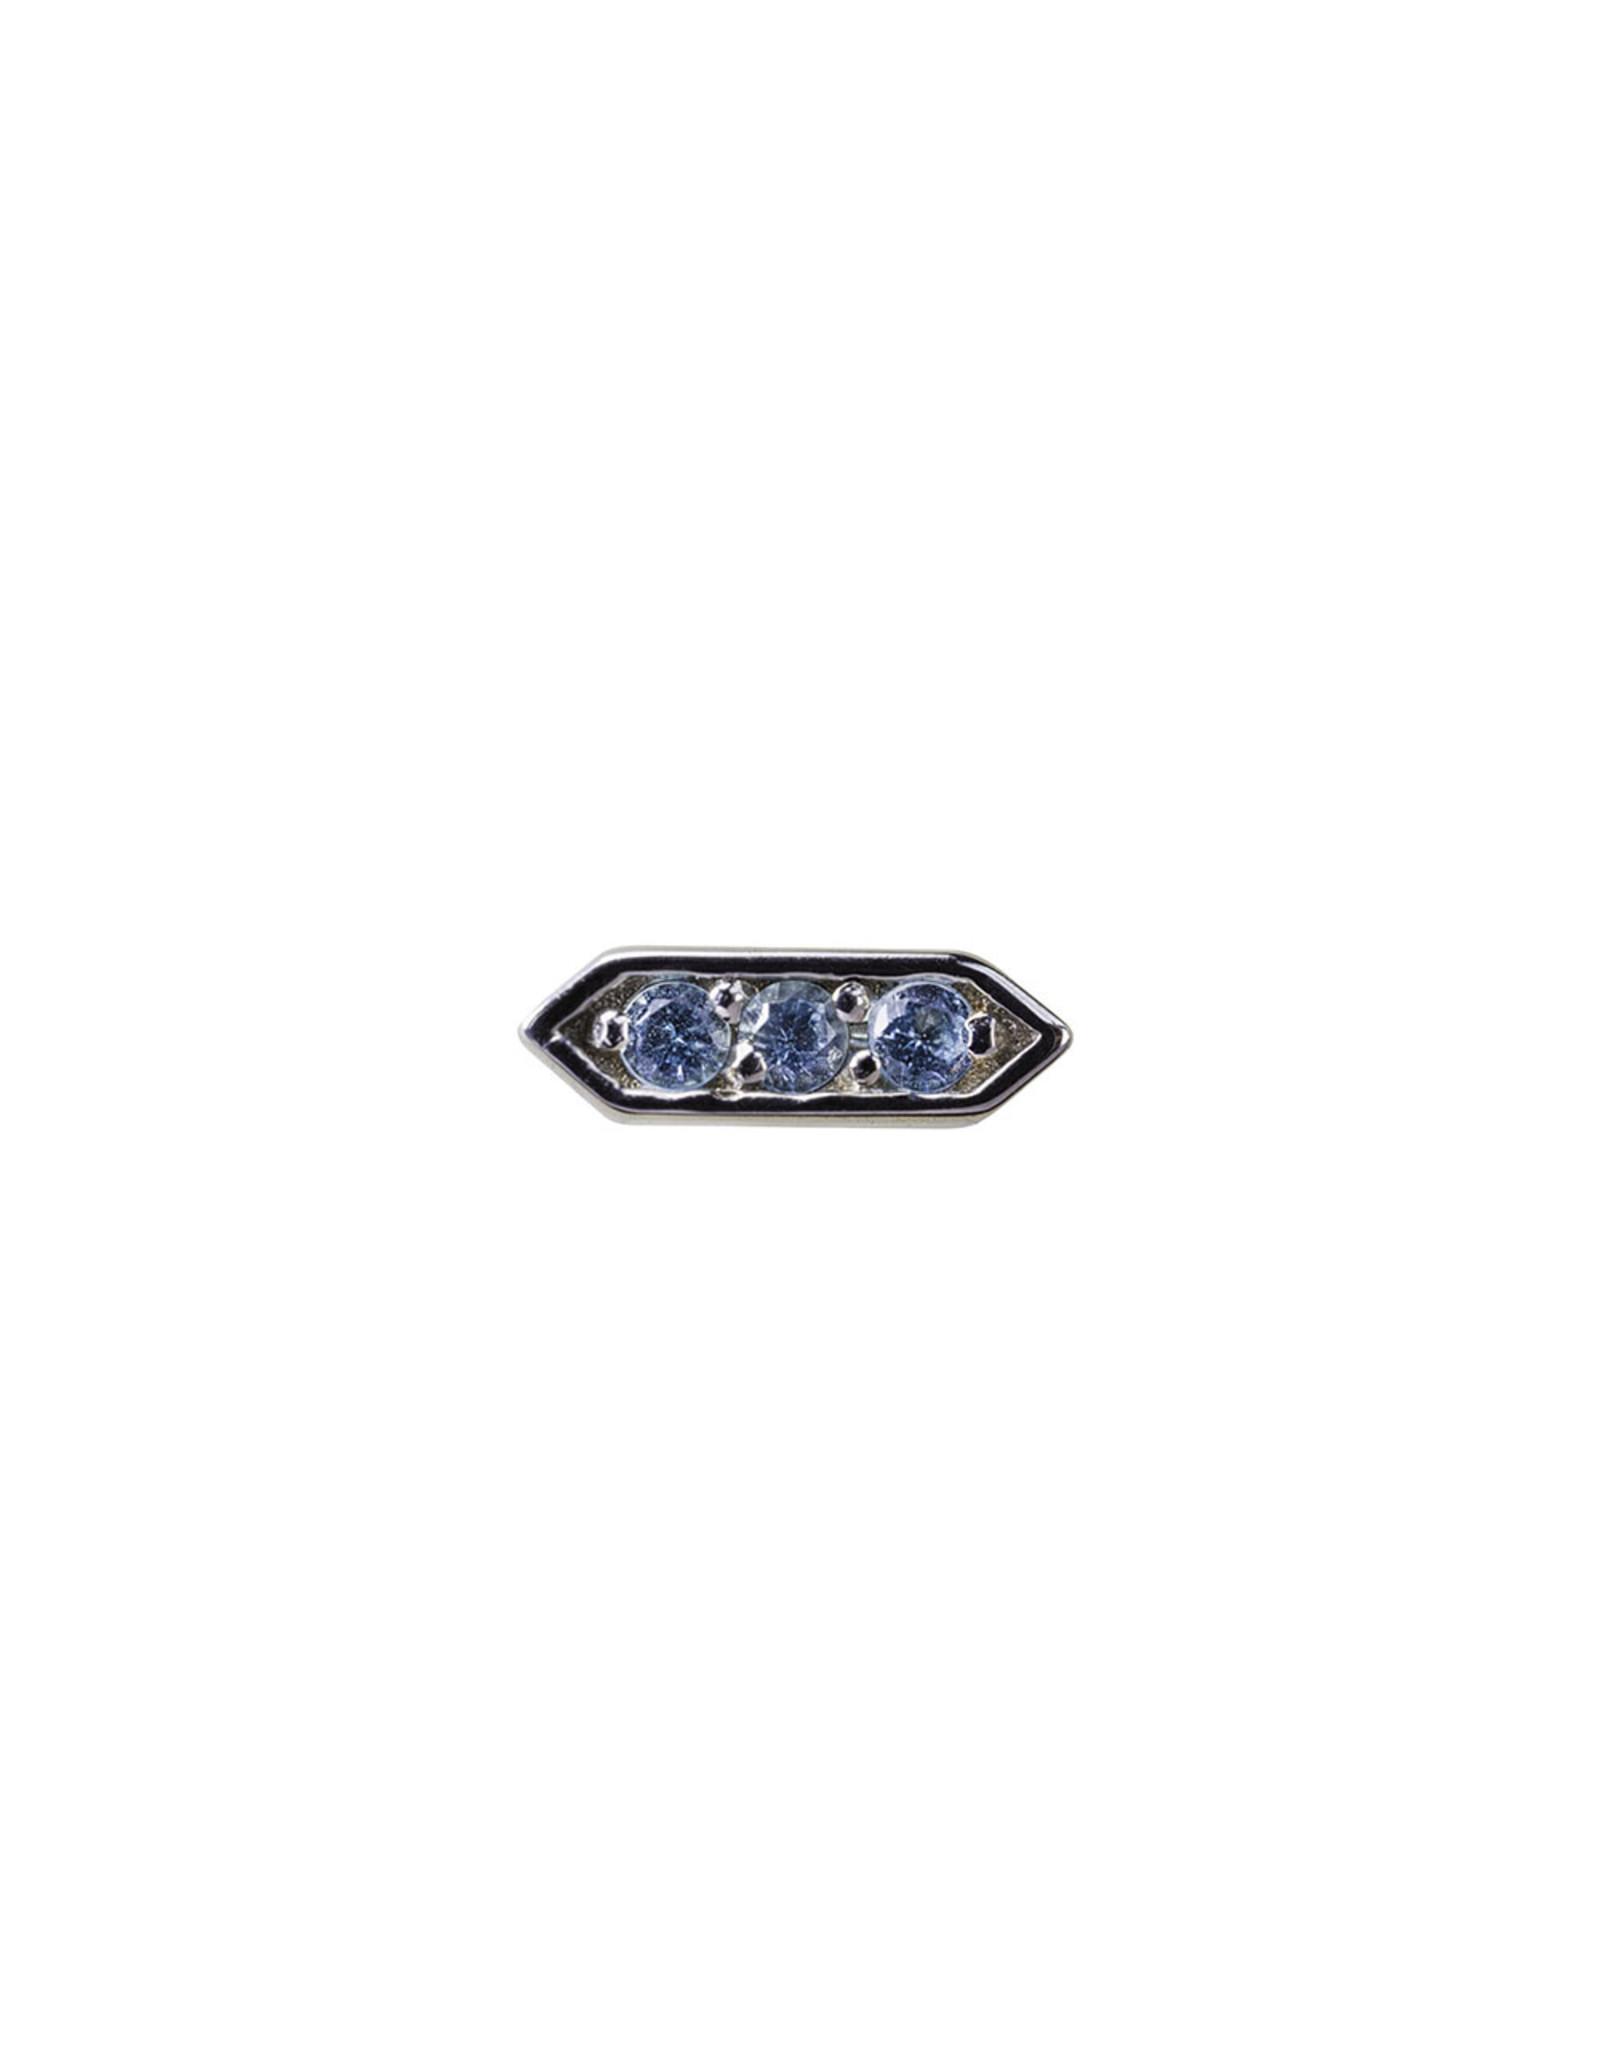 "BVLA BVLA white gold ""Sillan"" press fit end with 3x 1.25 AA Swiss Blue Topaz"